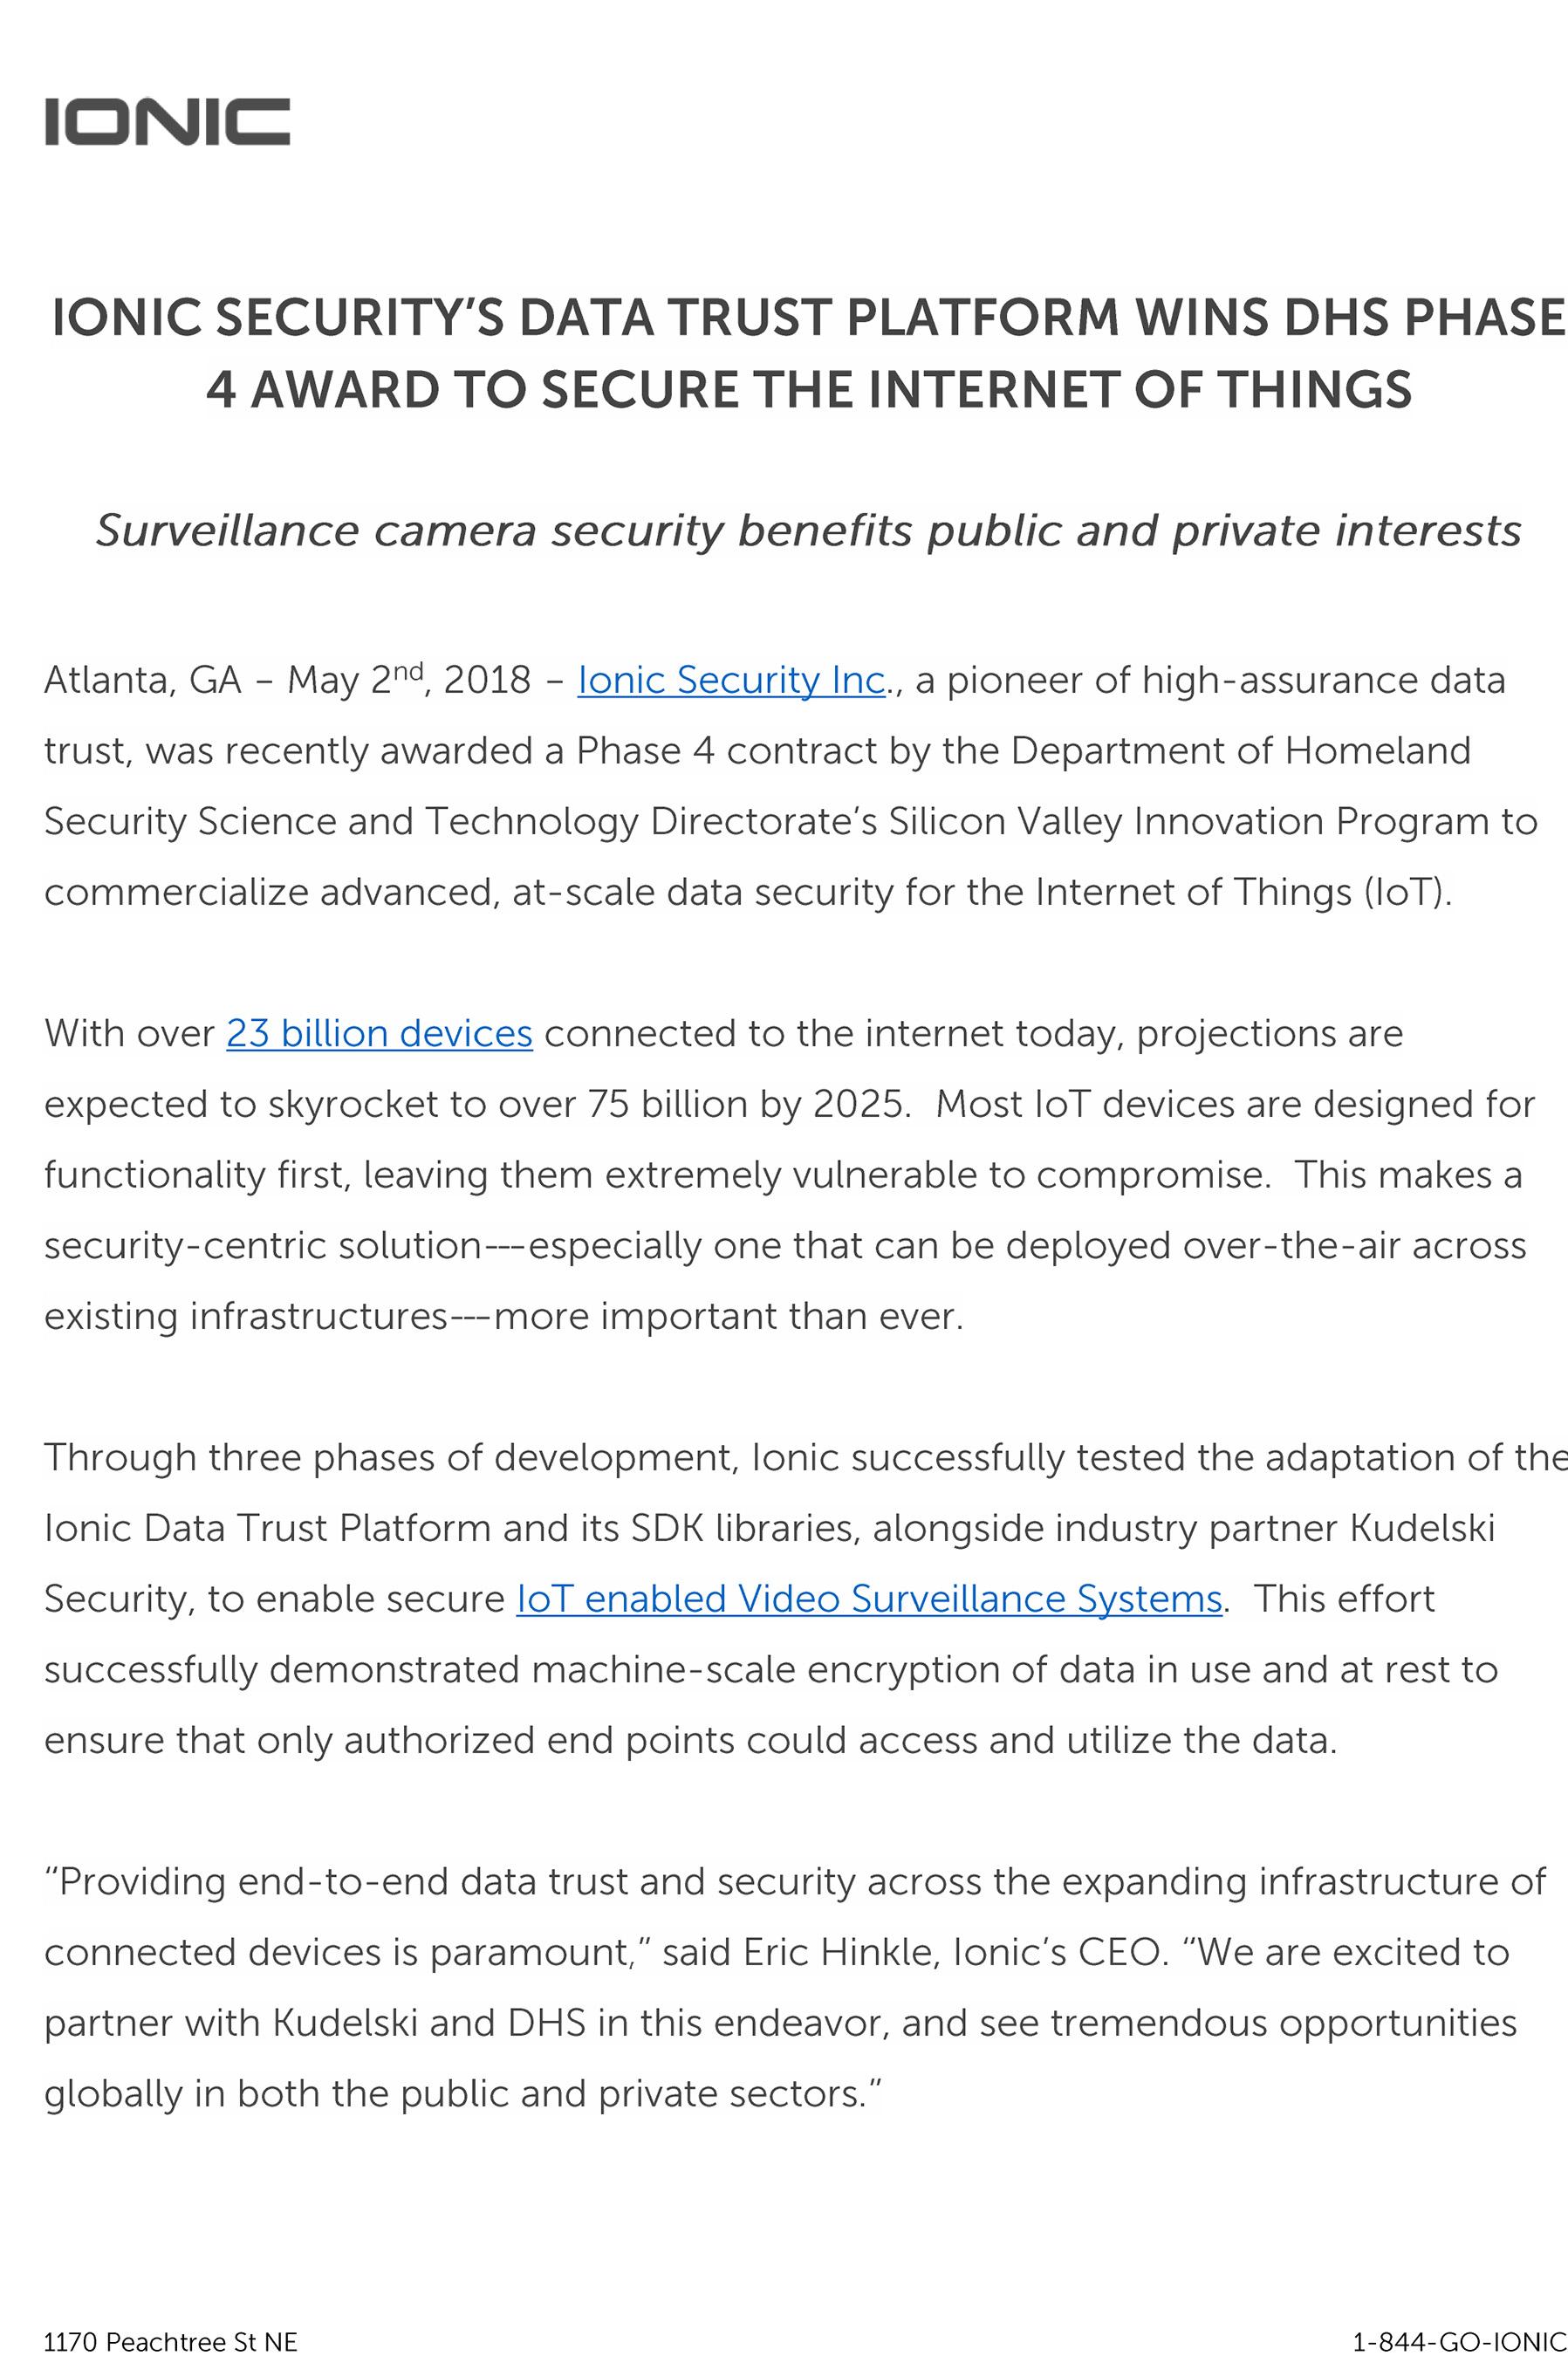 Ionic Announces Cross-Cloud Data Trust Ecosystem